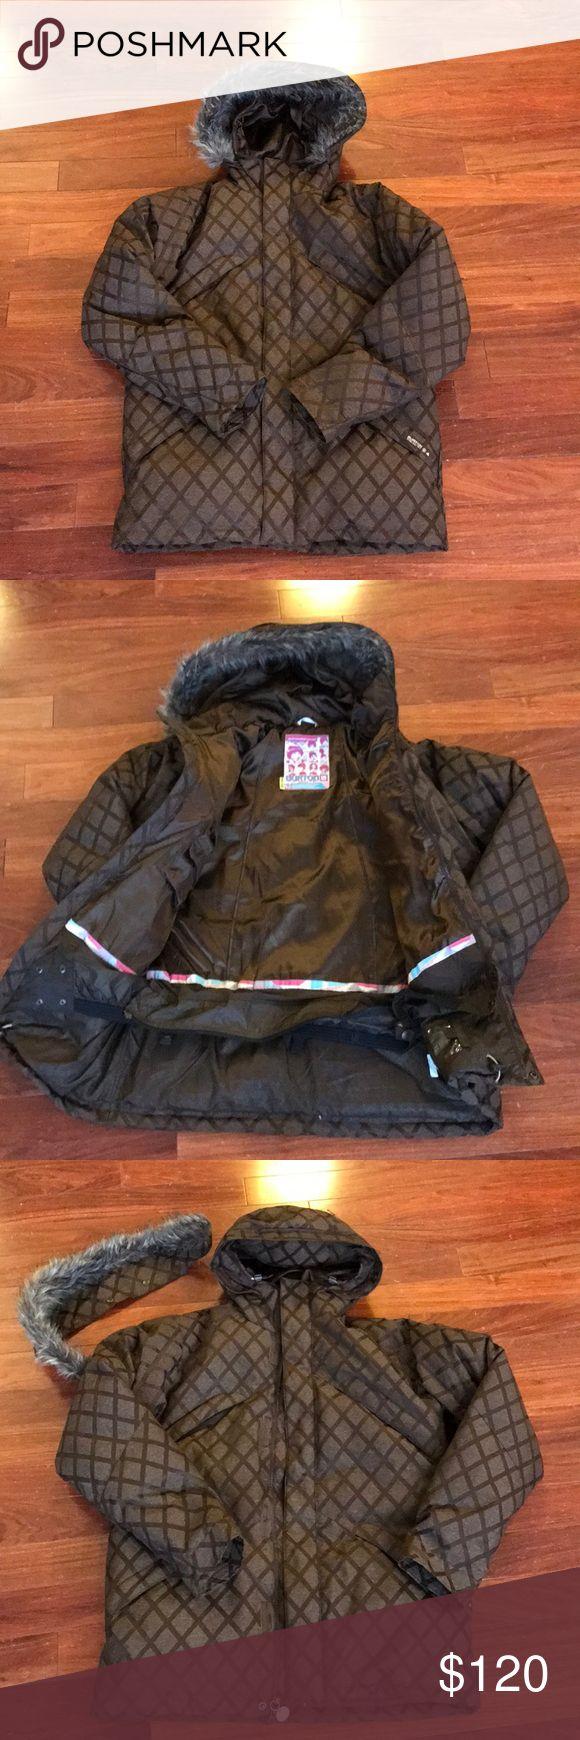 25+ cute Snowboarding jackets ideas on Pinterest ...